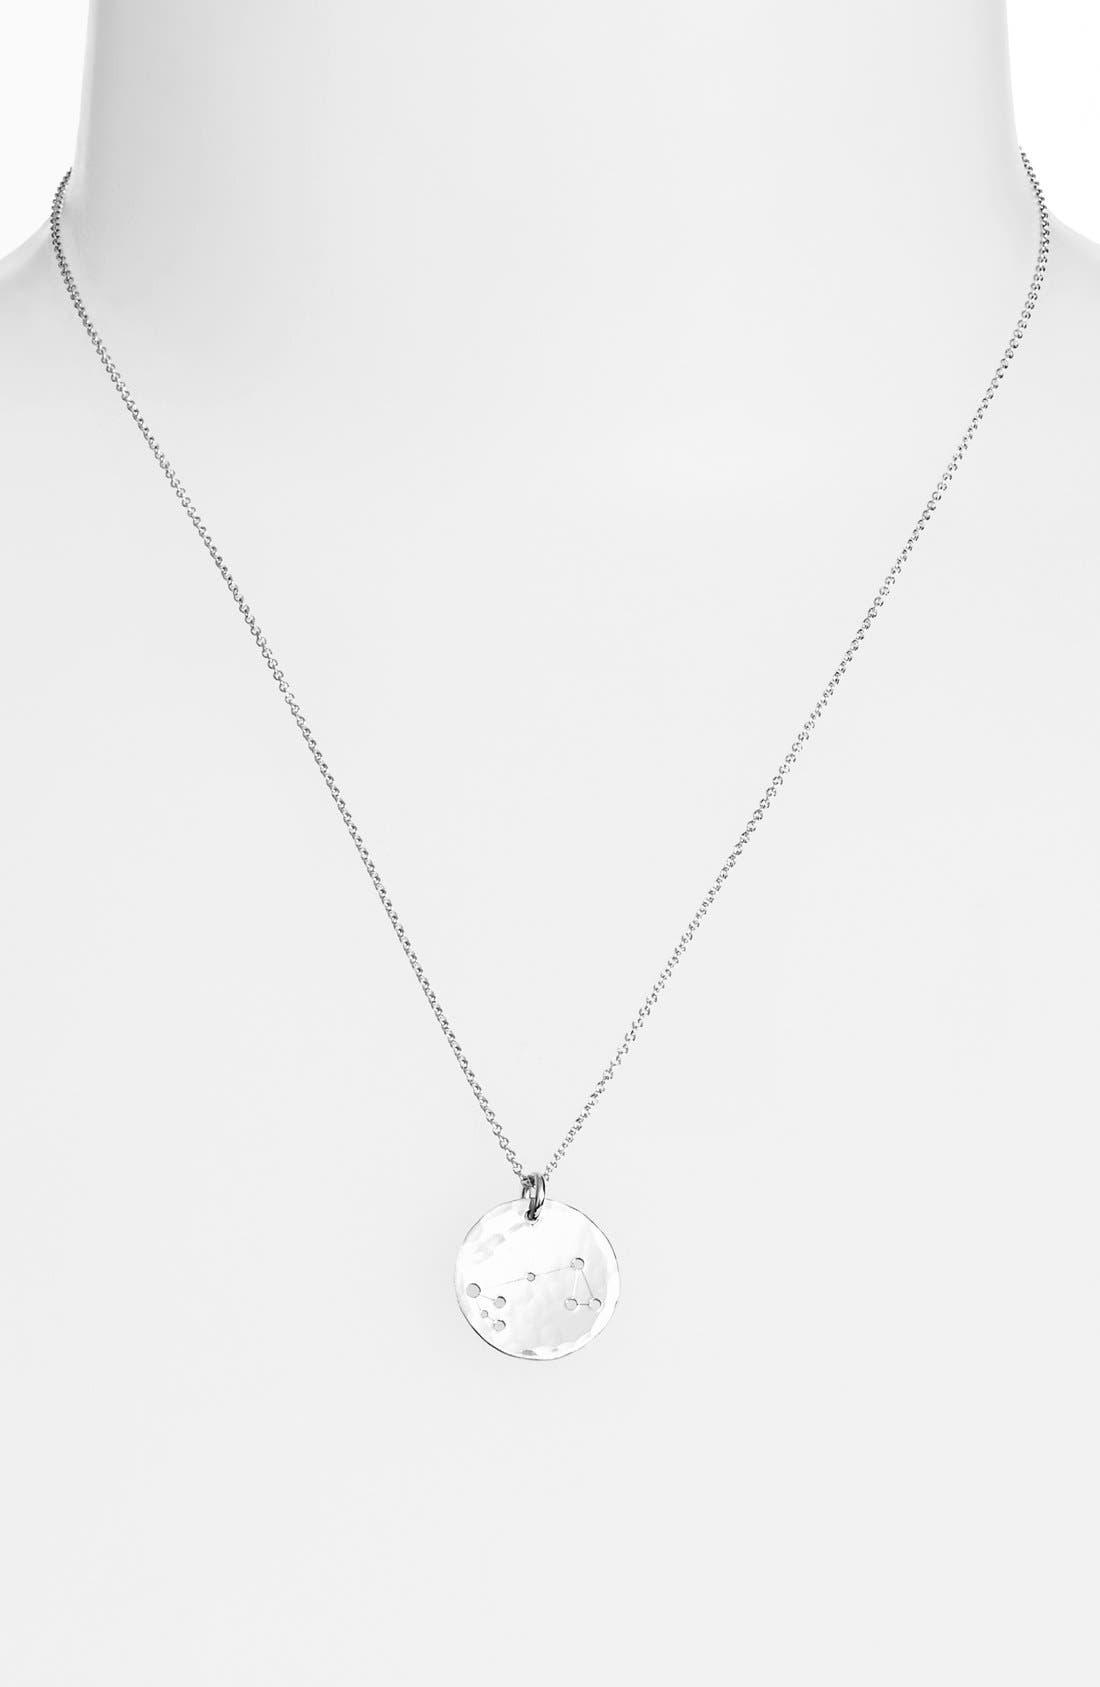 Ija 'Small Zodiac' Sterling Silver Necklace,                             Main thumbnail 7, color,